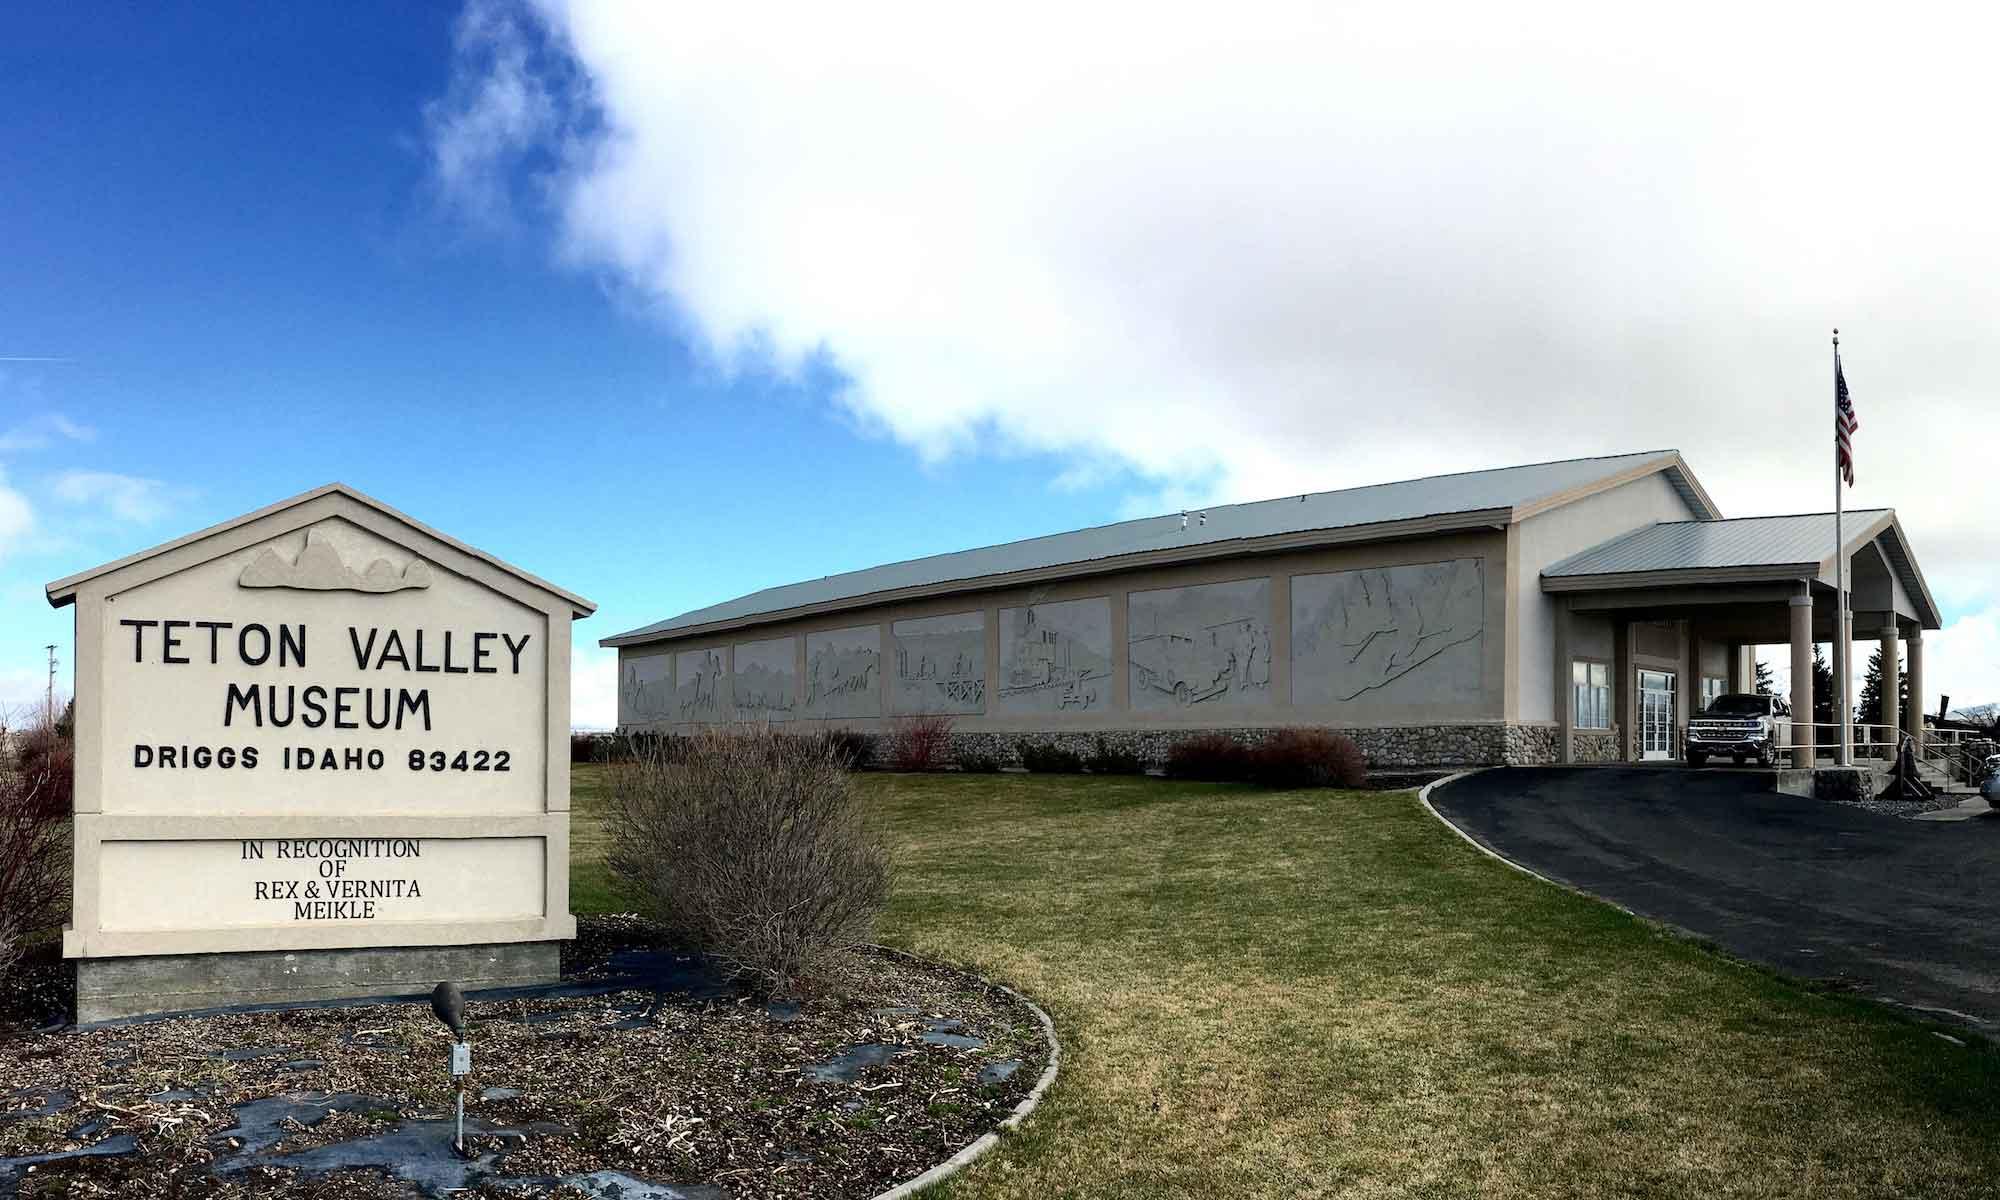 Teton Valley Museum